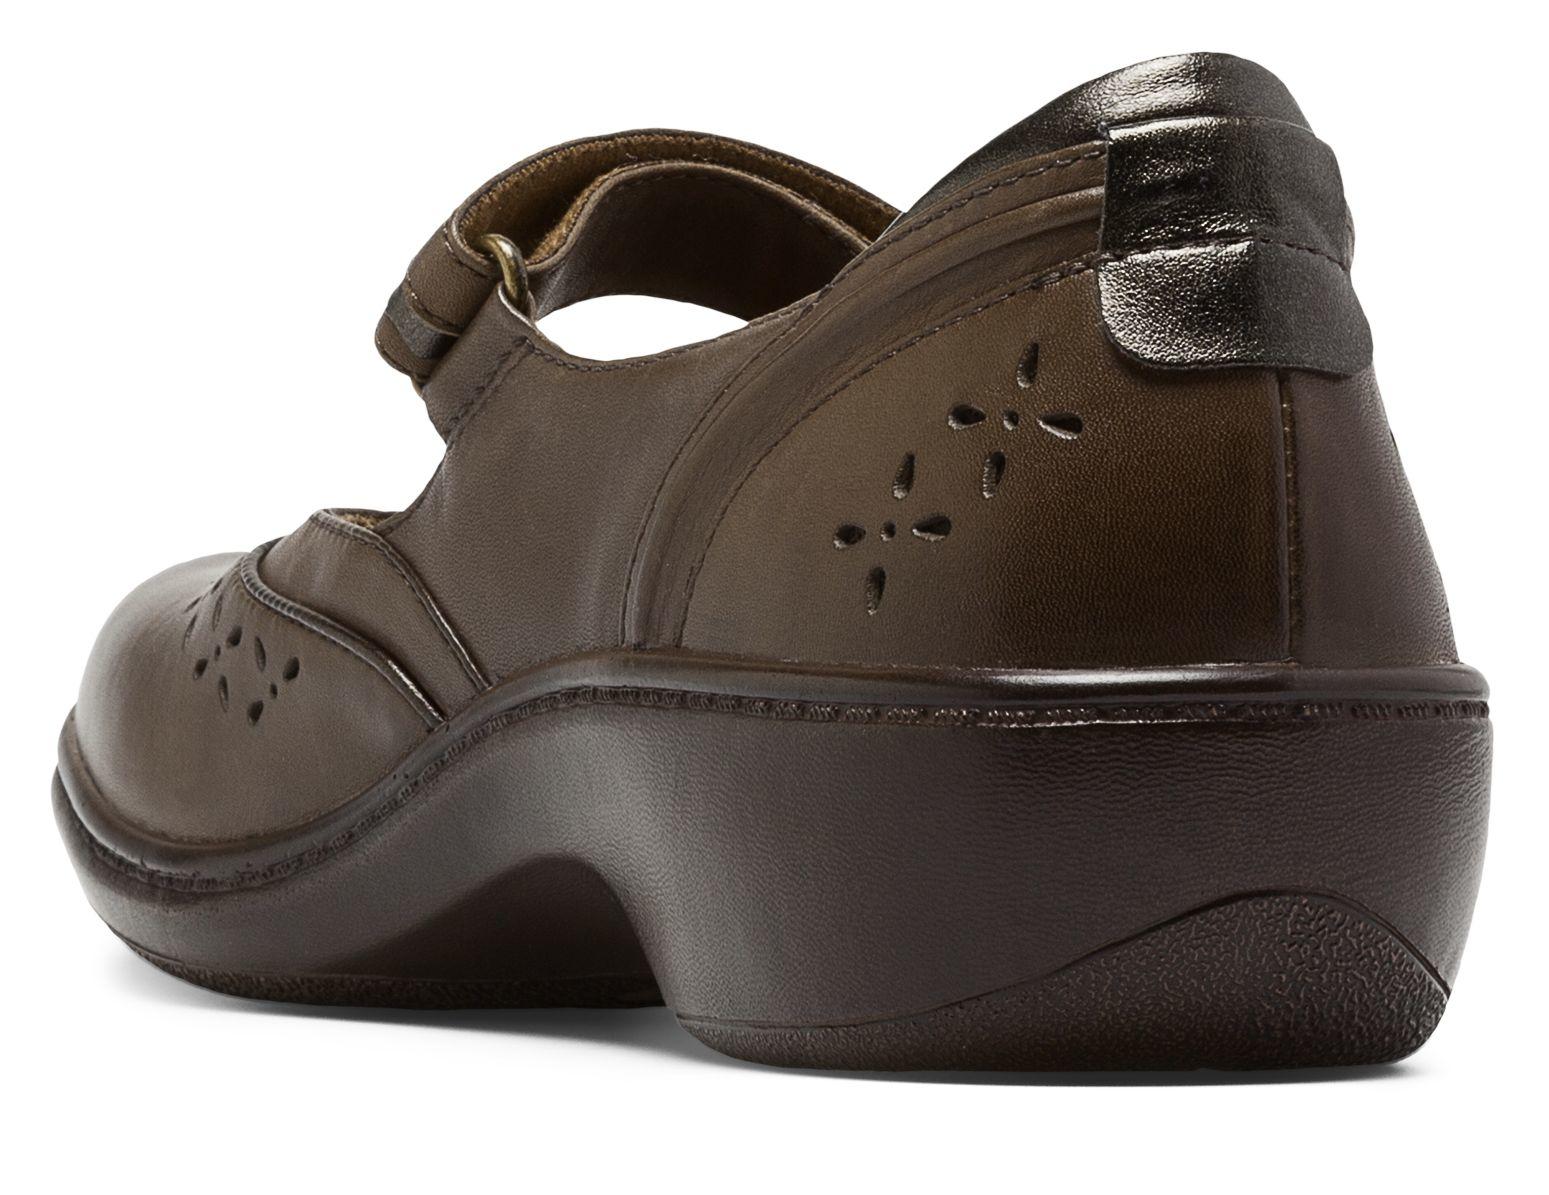 New Balance Aravon Dolly Ar Aravon Shoes